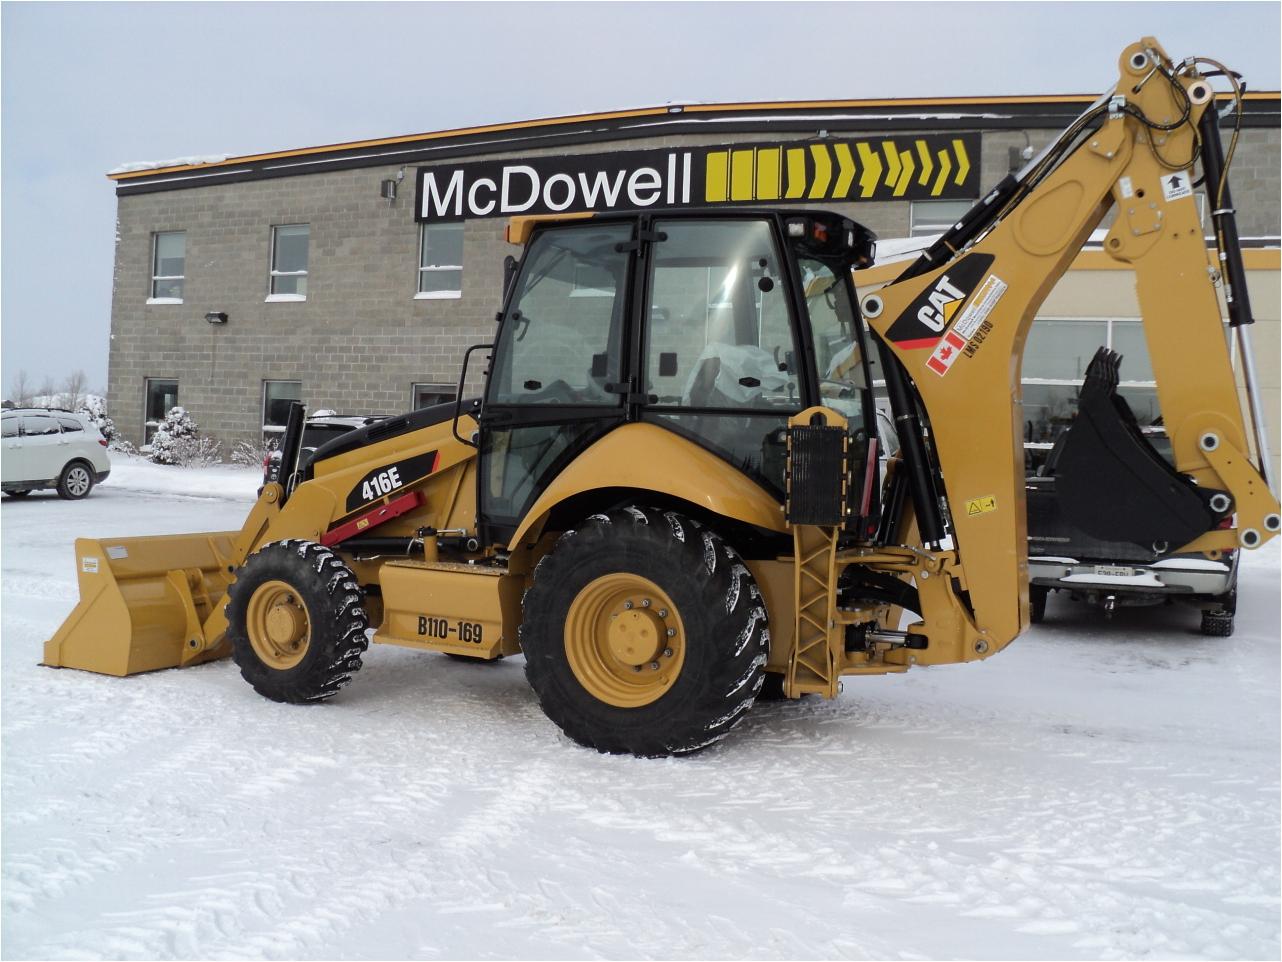 2012 CATERPILLAR 416E Backhoe for sale - McDowell B Equipment Sudbury ...